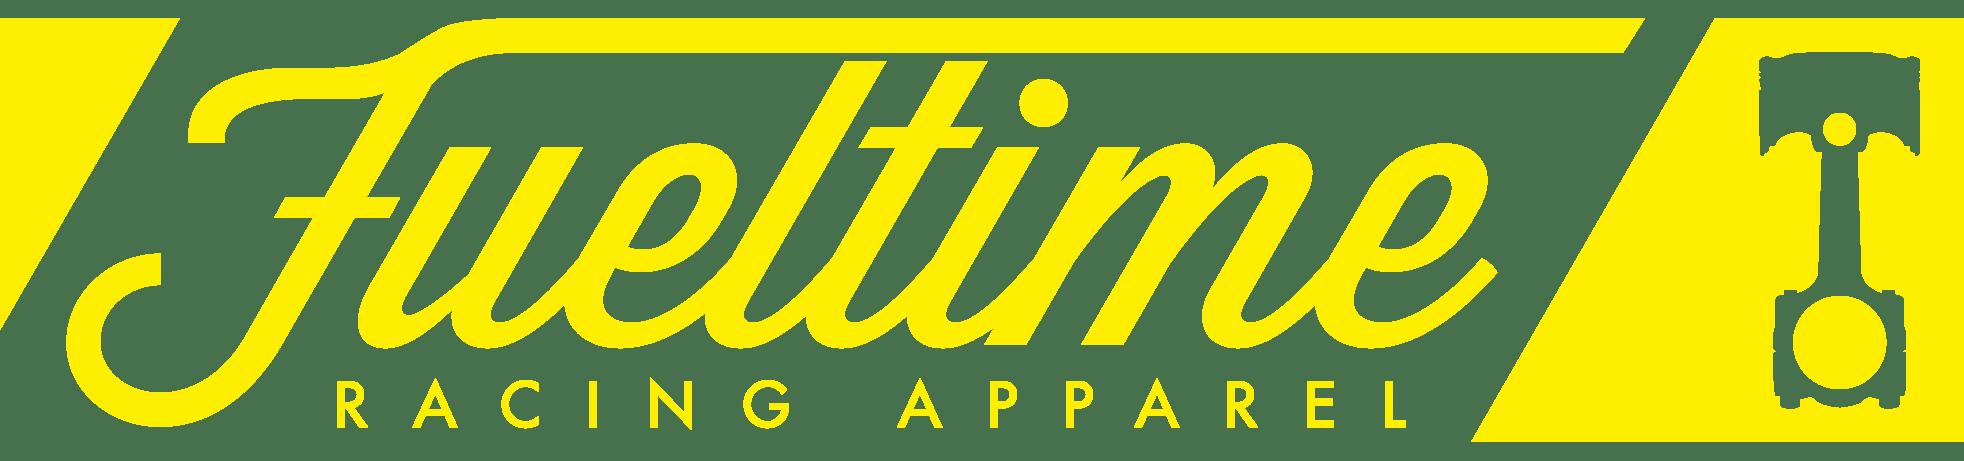 Fueltime Racing Apparel ®